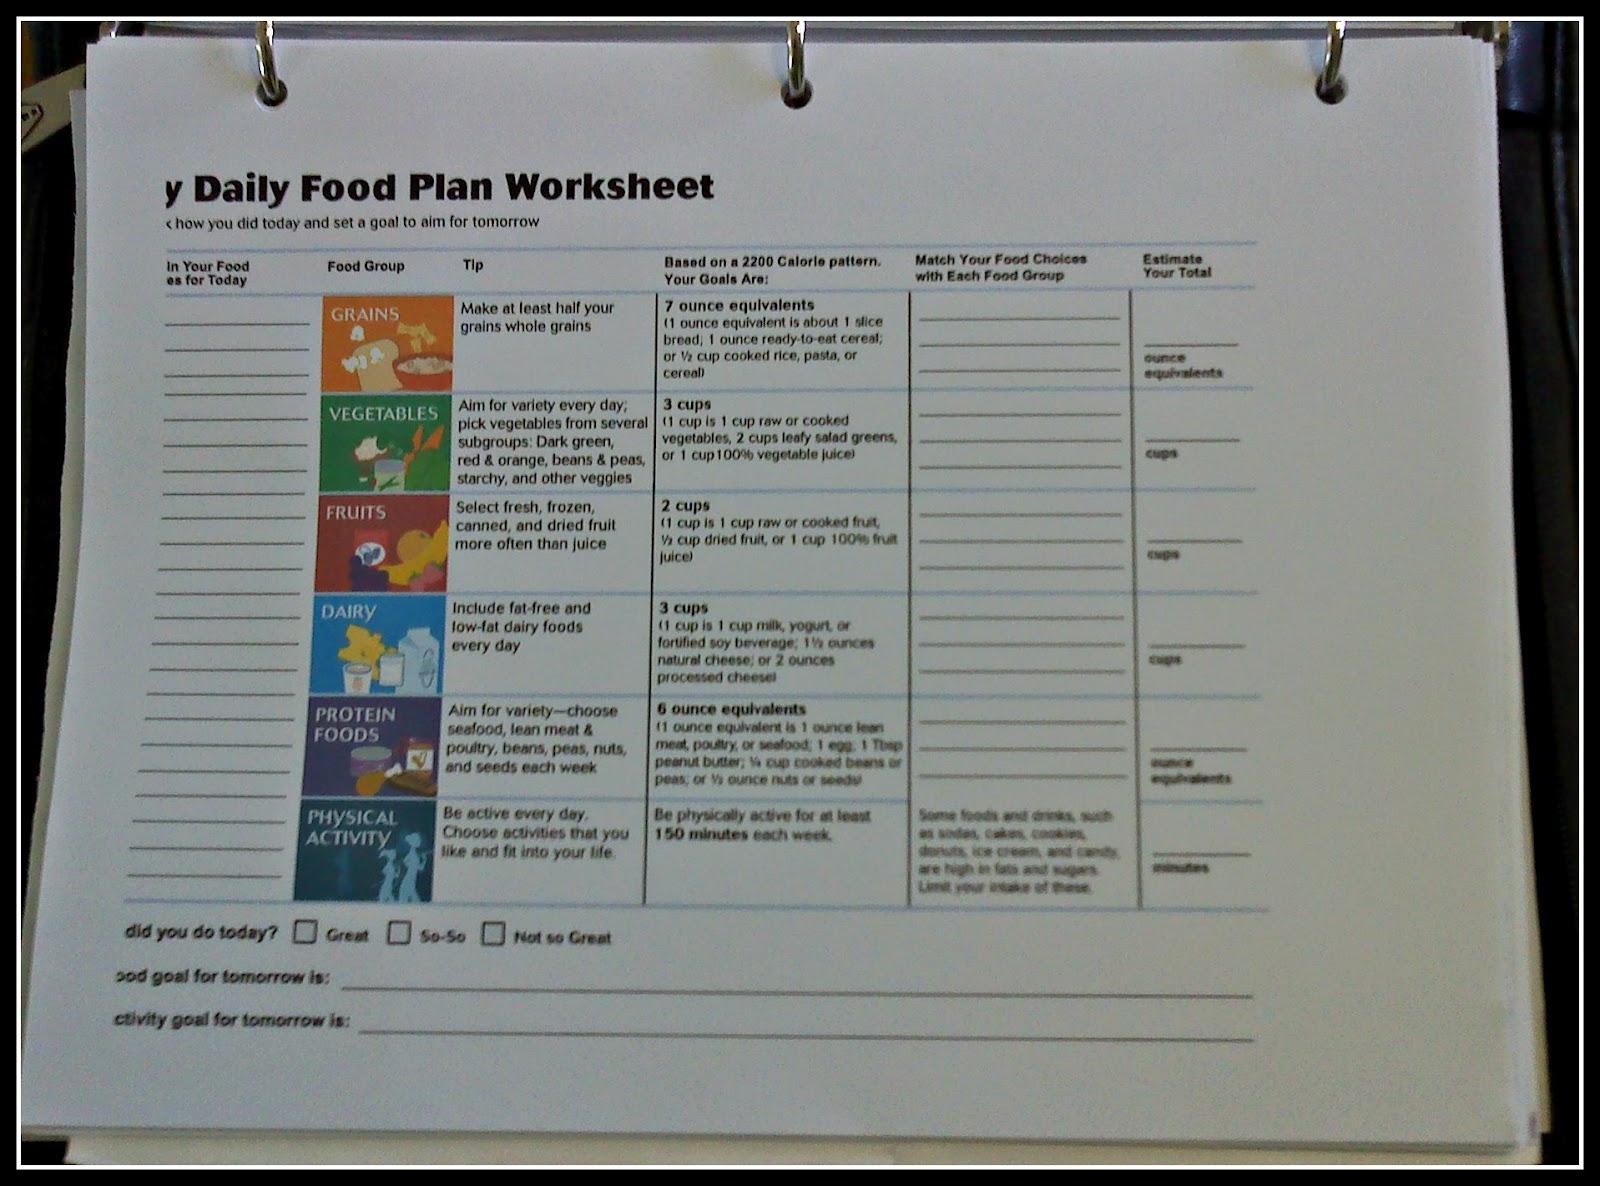 Worksheet My Daily Food Plan Worksheet Grass Fedjp